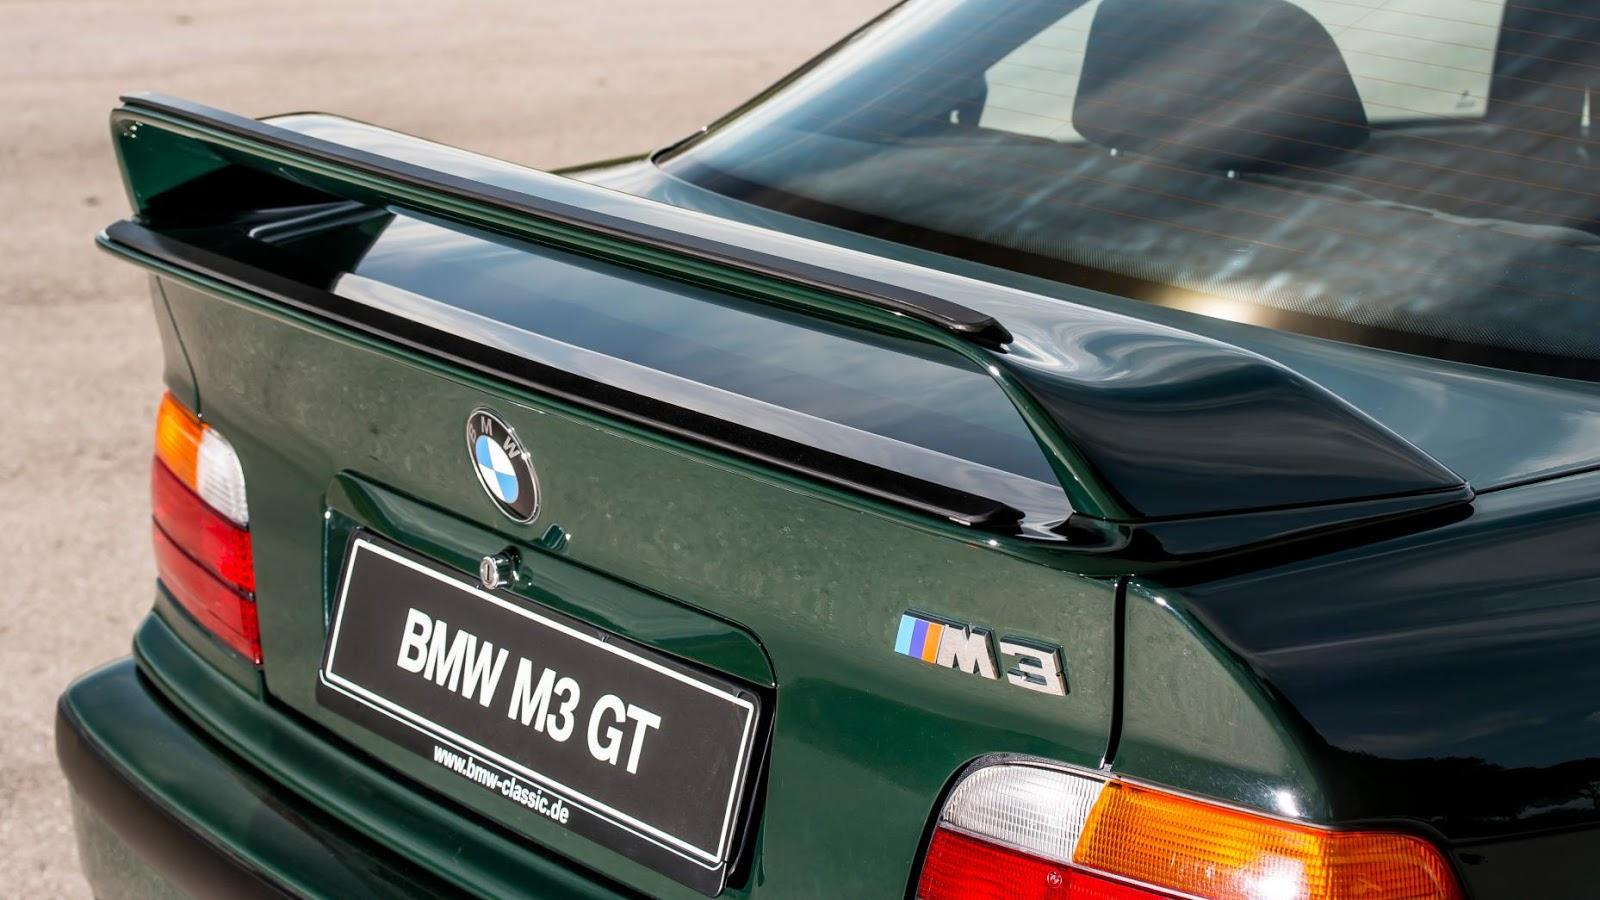 BMW M3 GT - 1995